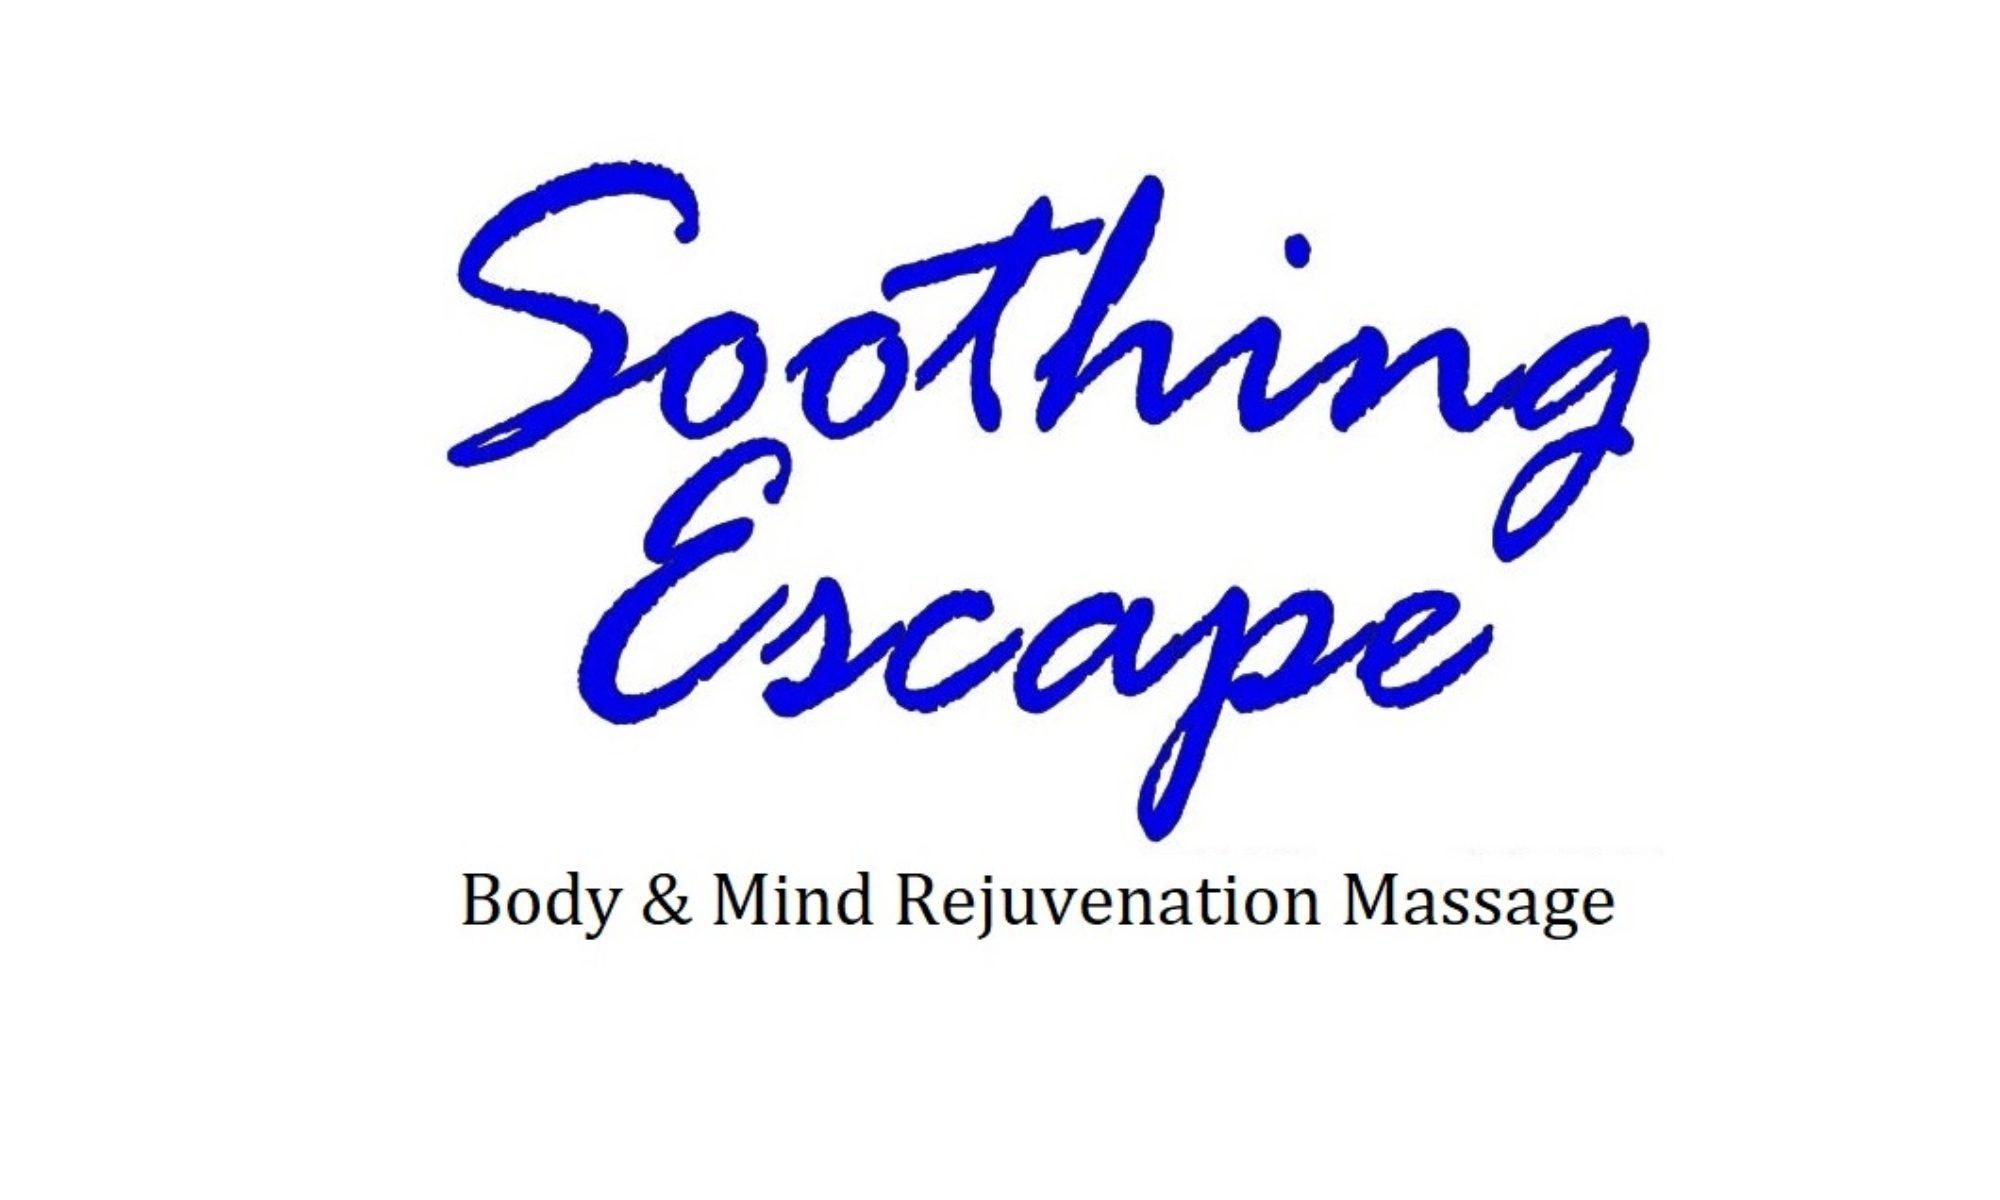 Soothing Escape: Body & Mind Rejuvenation Massage